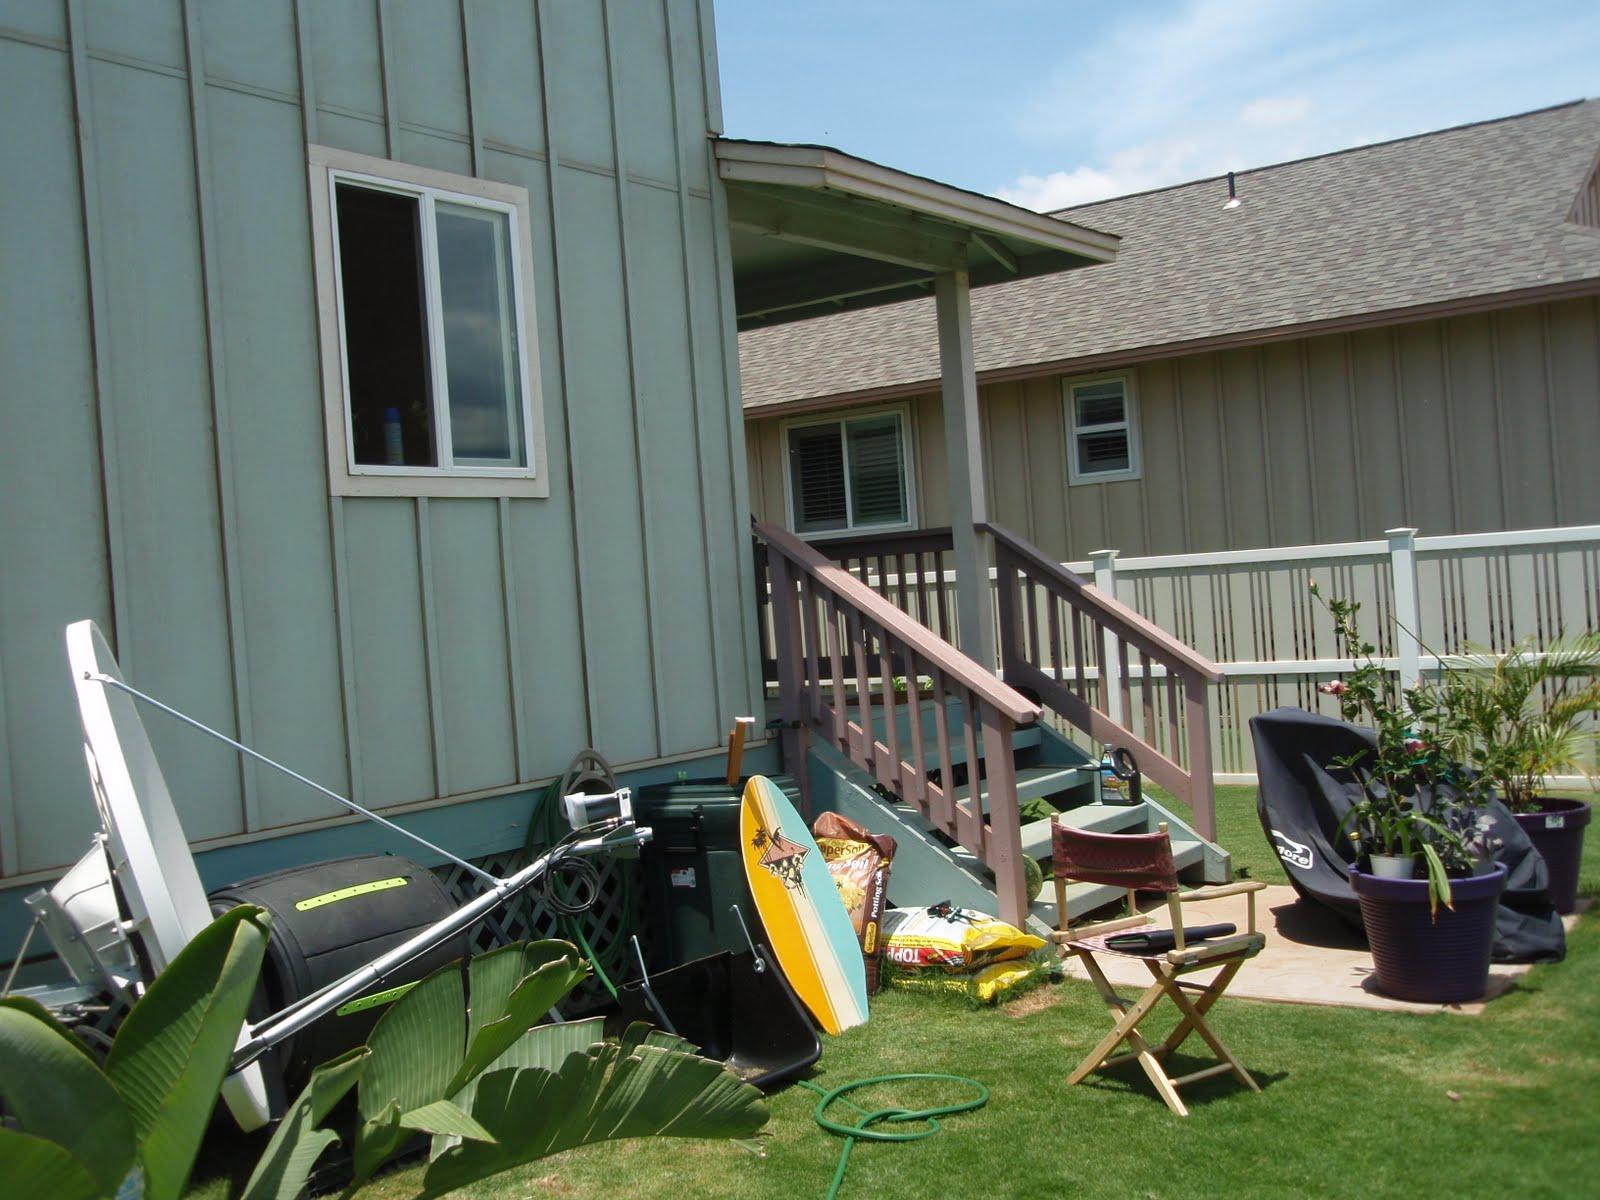 New deck expansion over slab area